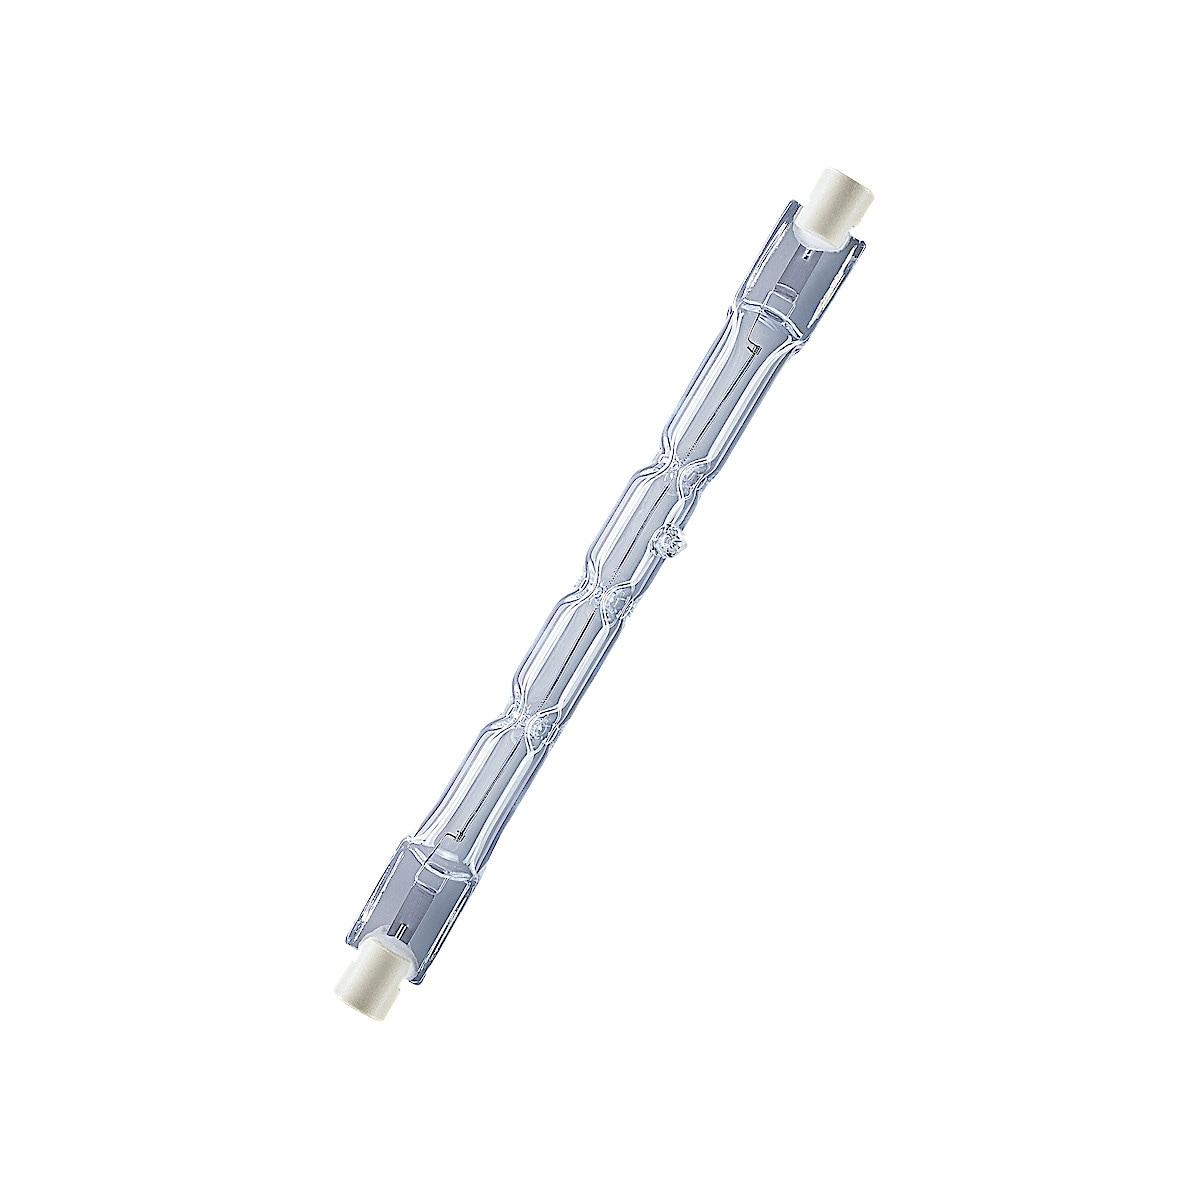 Halogeenilamppu R7s 118 mm Osram Haloline